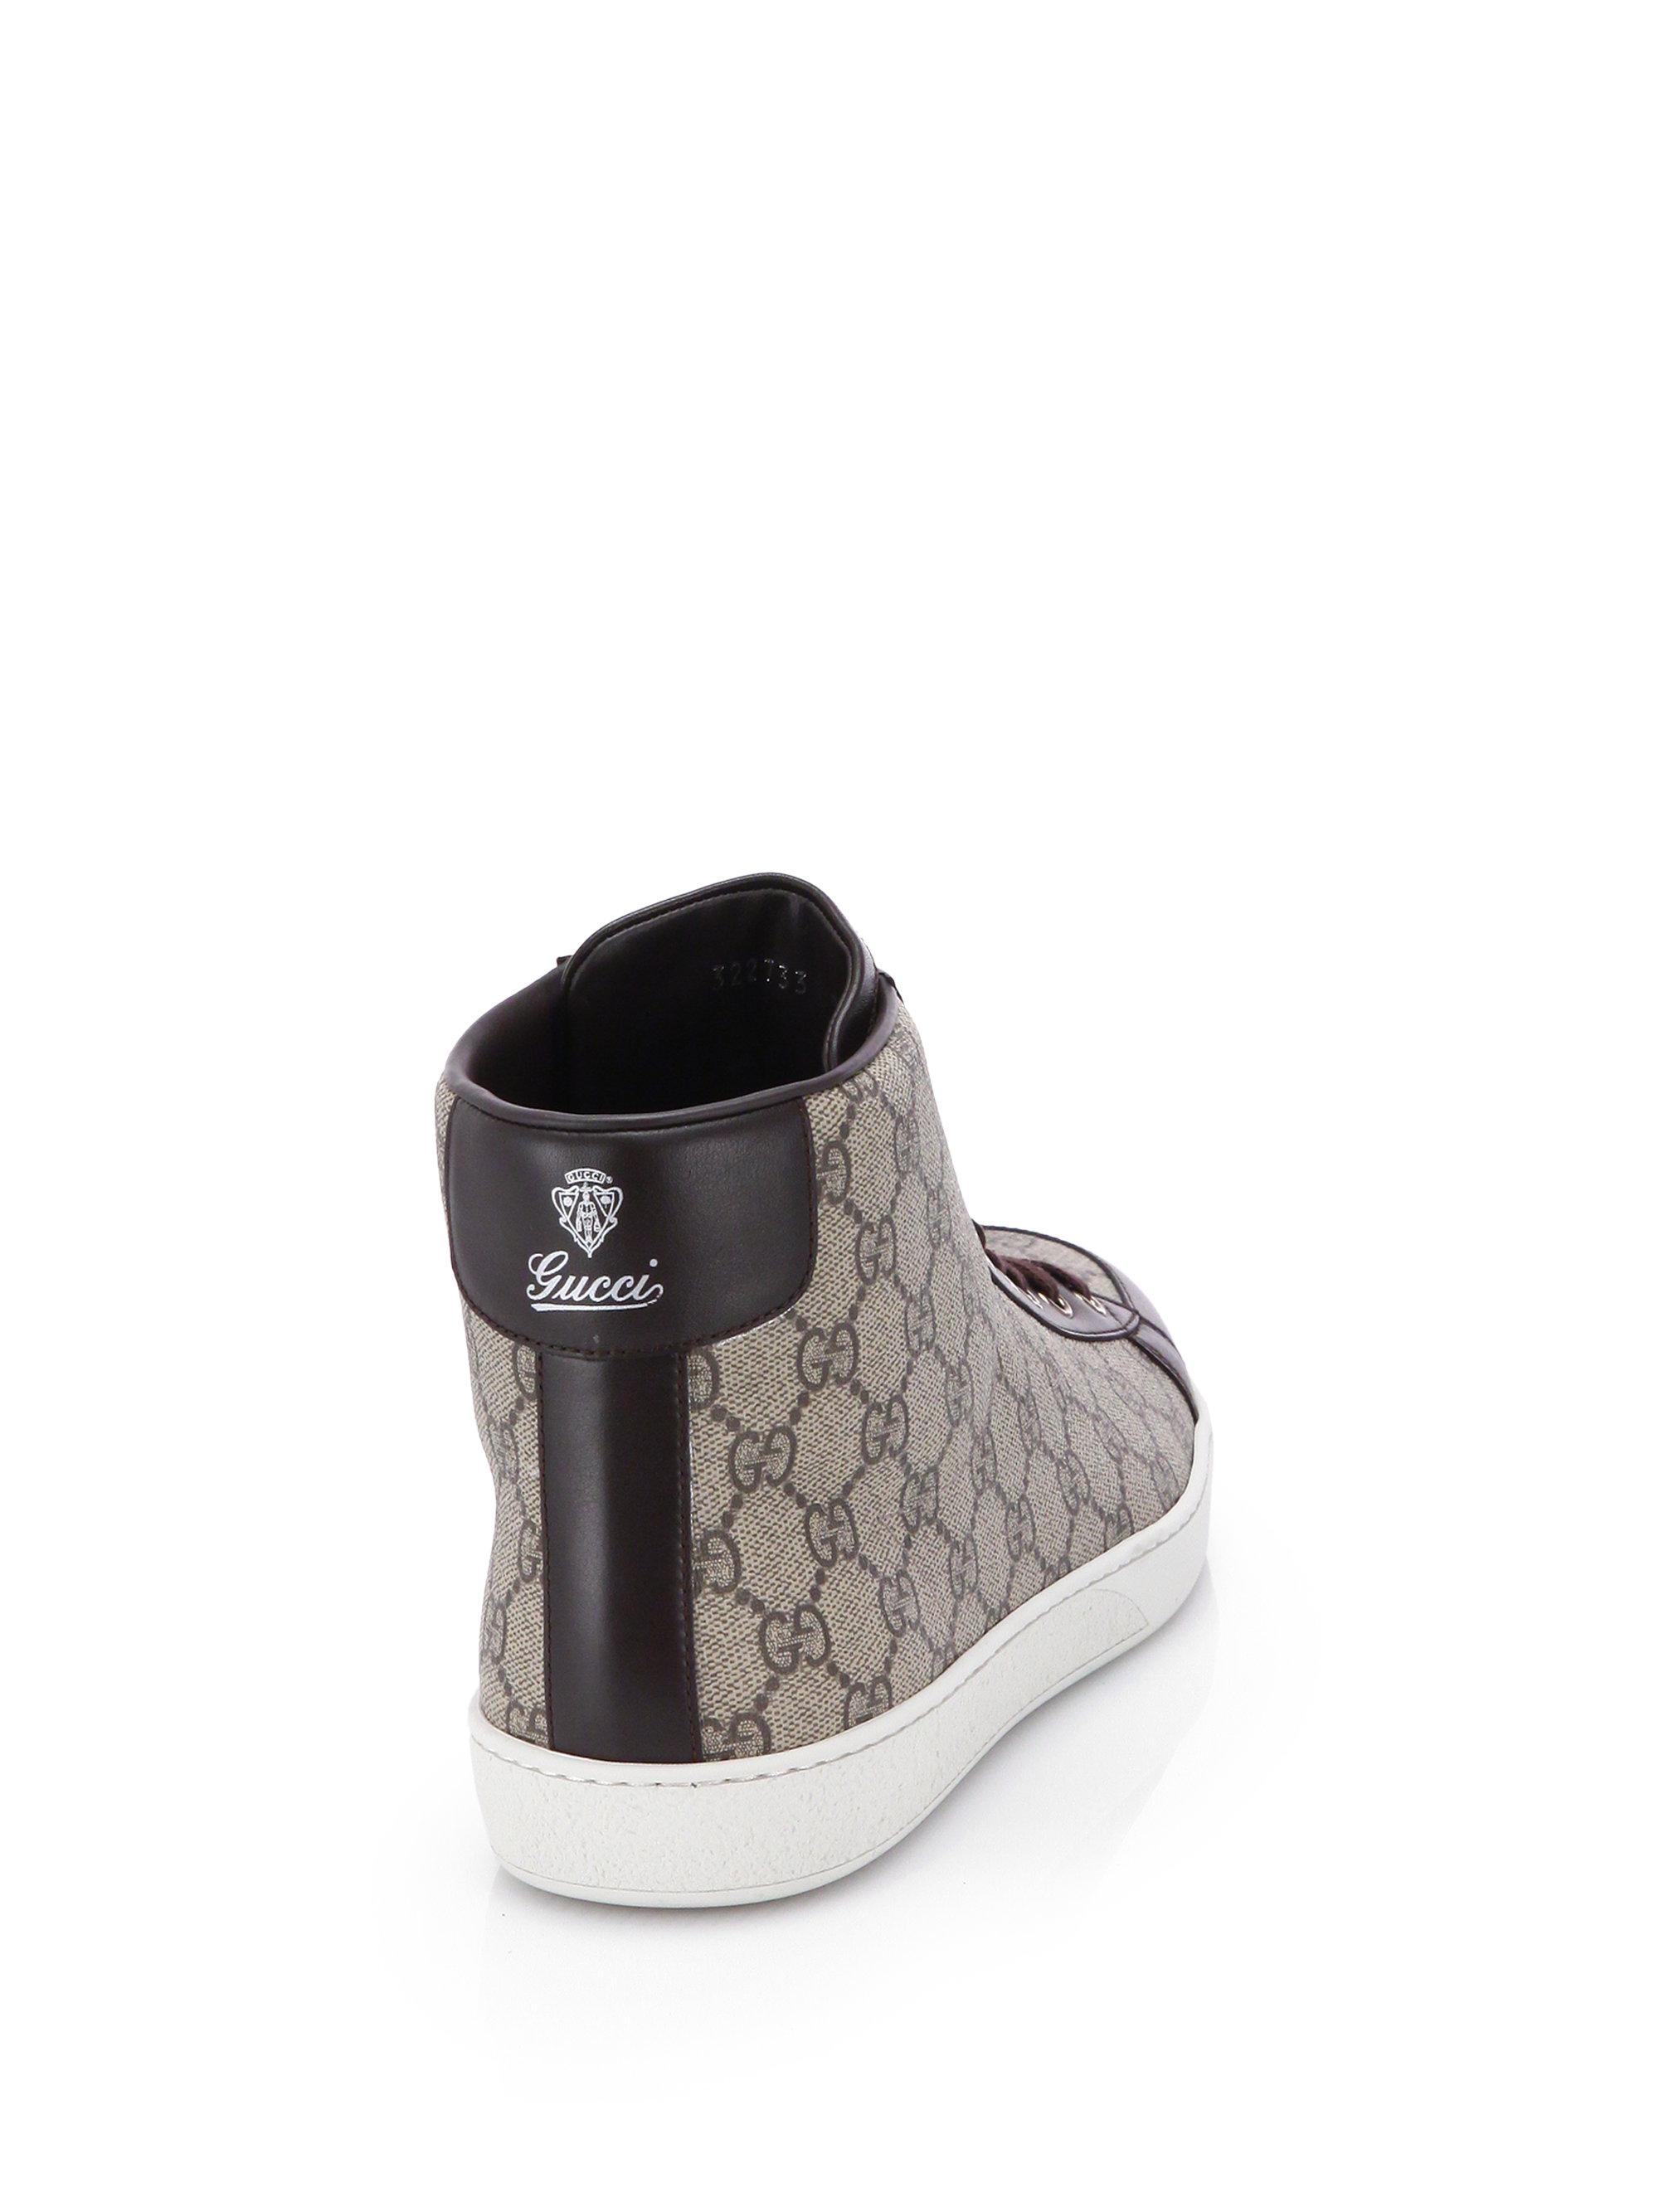 e49de03ba4d Lyst - Gucci Gg Supreme Canvas High-top Sneakers in Natural for Men